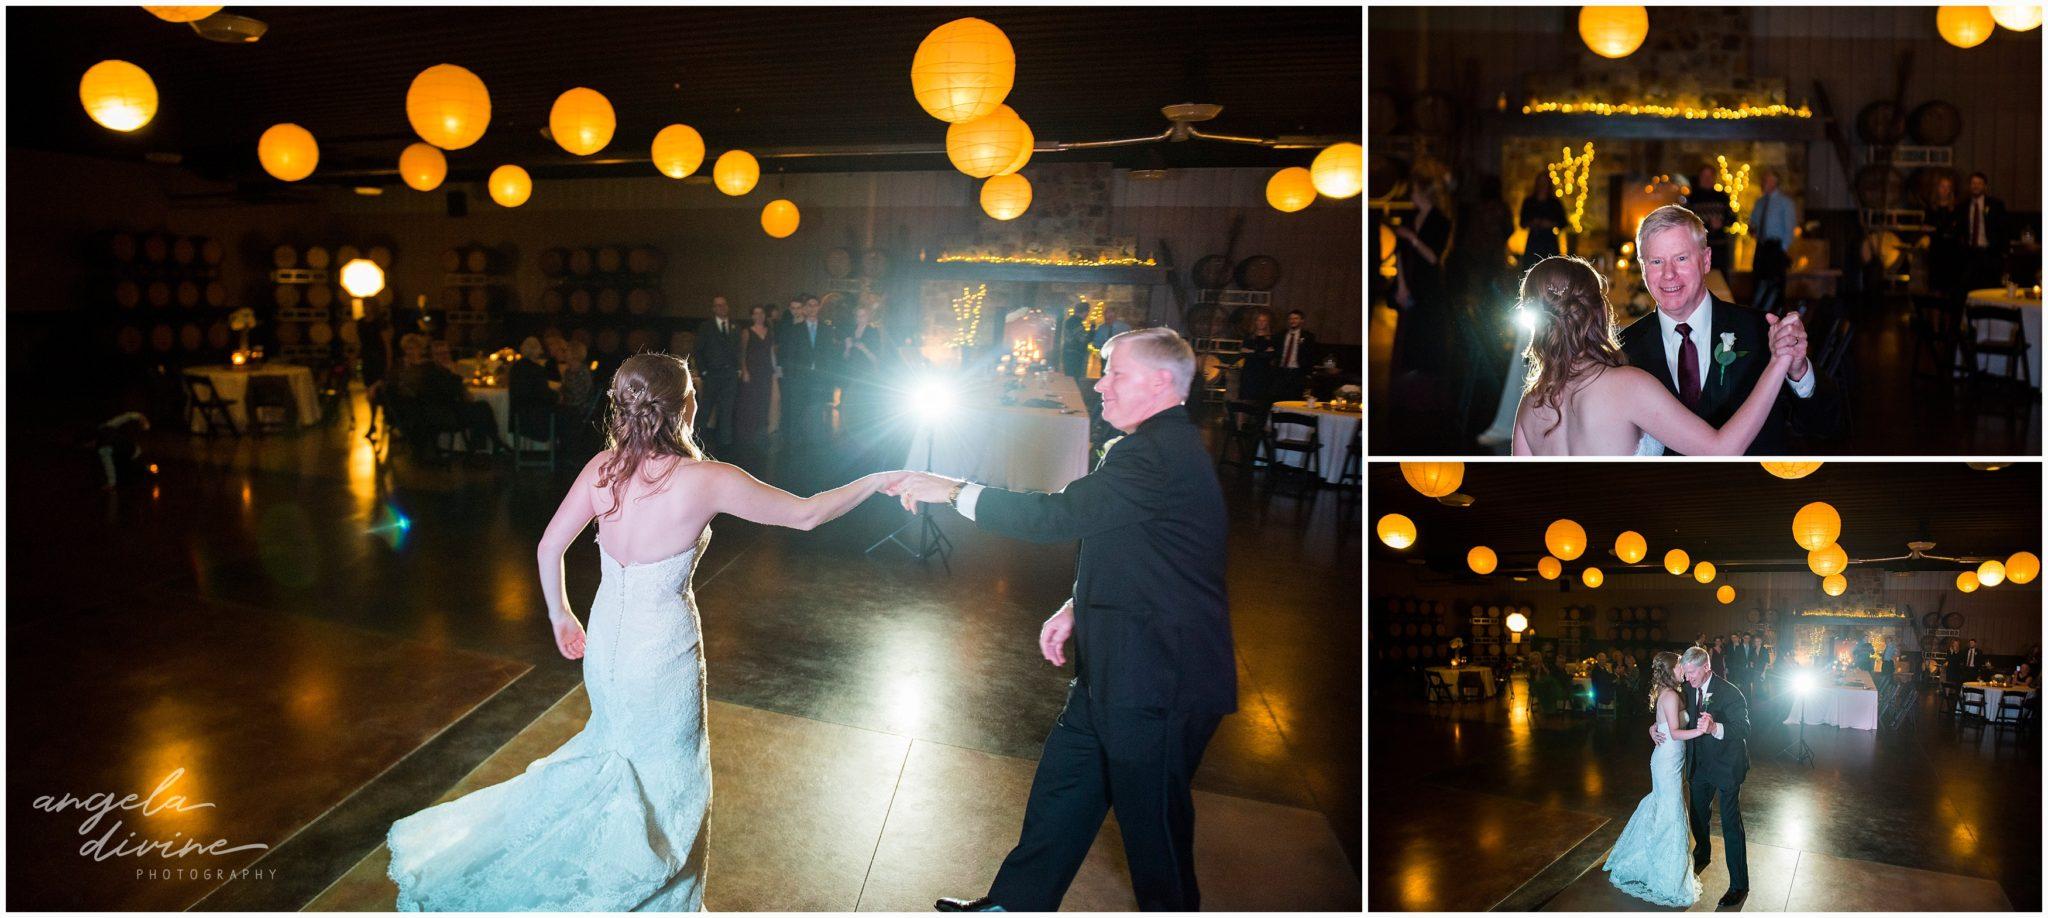 Carlos Creek Winery wedding father daughter dance